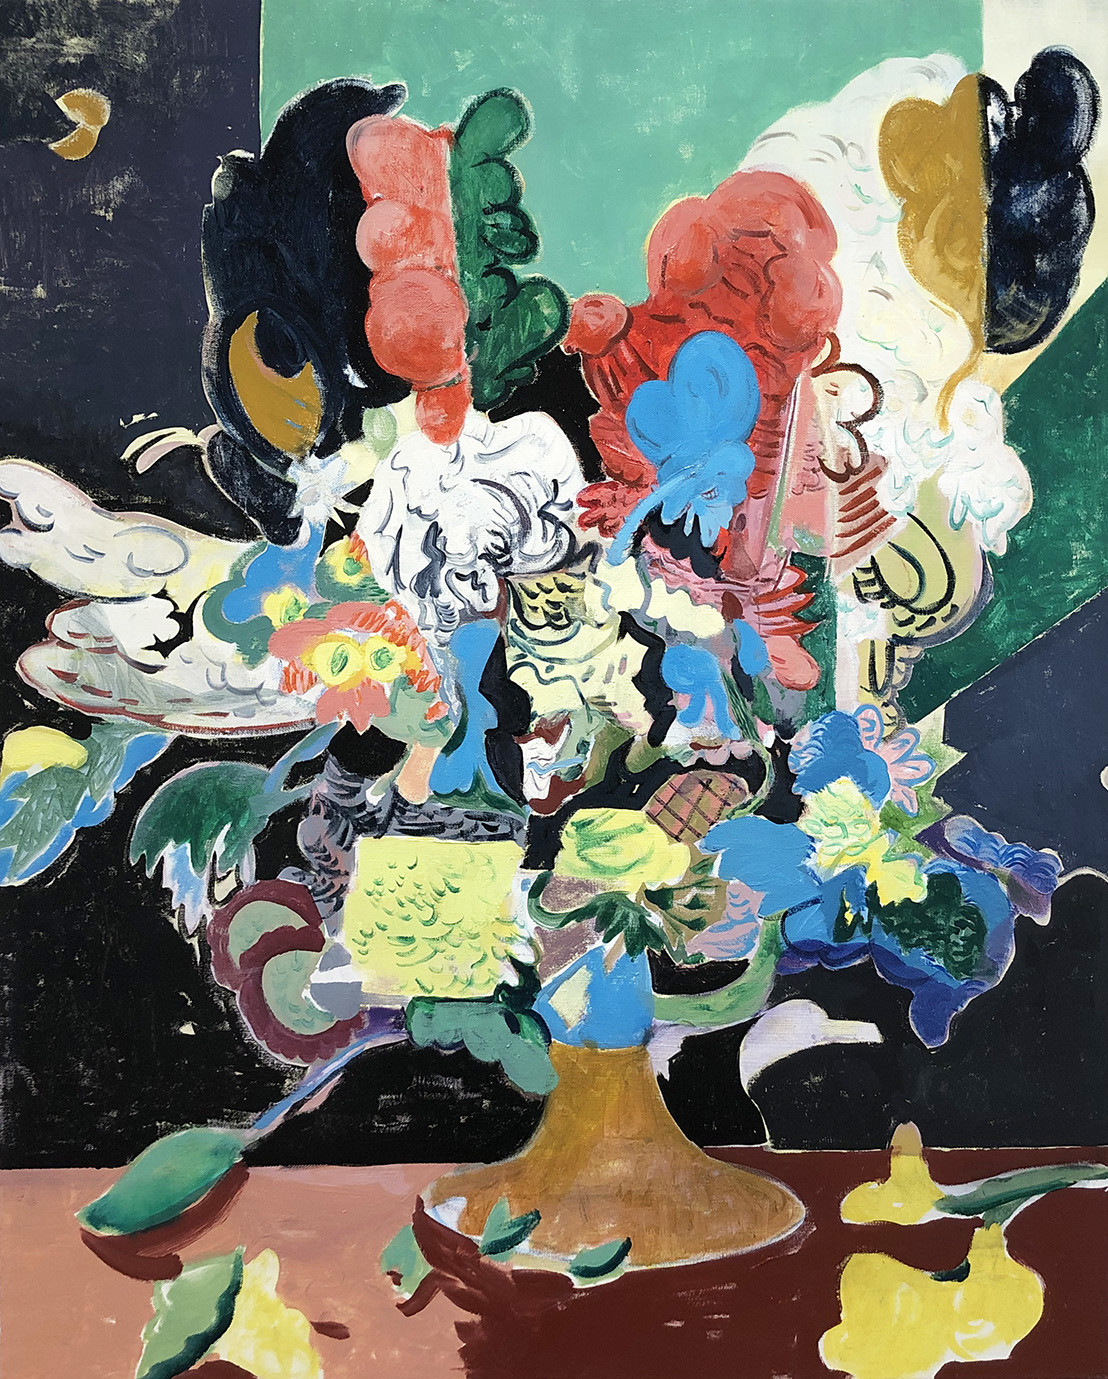 "<span class=""link fancybox-details-link""><a href=""/artists/50-david-price/works/498/"">View Detail Page</a></span><div class=""artist""><strong>David Price</strong></div> <div class=""title""><em>Still Life, June</em>, 2018</div> <div class=""medium"">Oil on canvas</div> <div class=""dimensions"">100 x 81cm</div><div class=""copyright_line"">Copyright The Artist</div>"